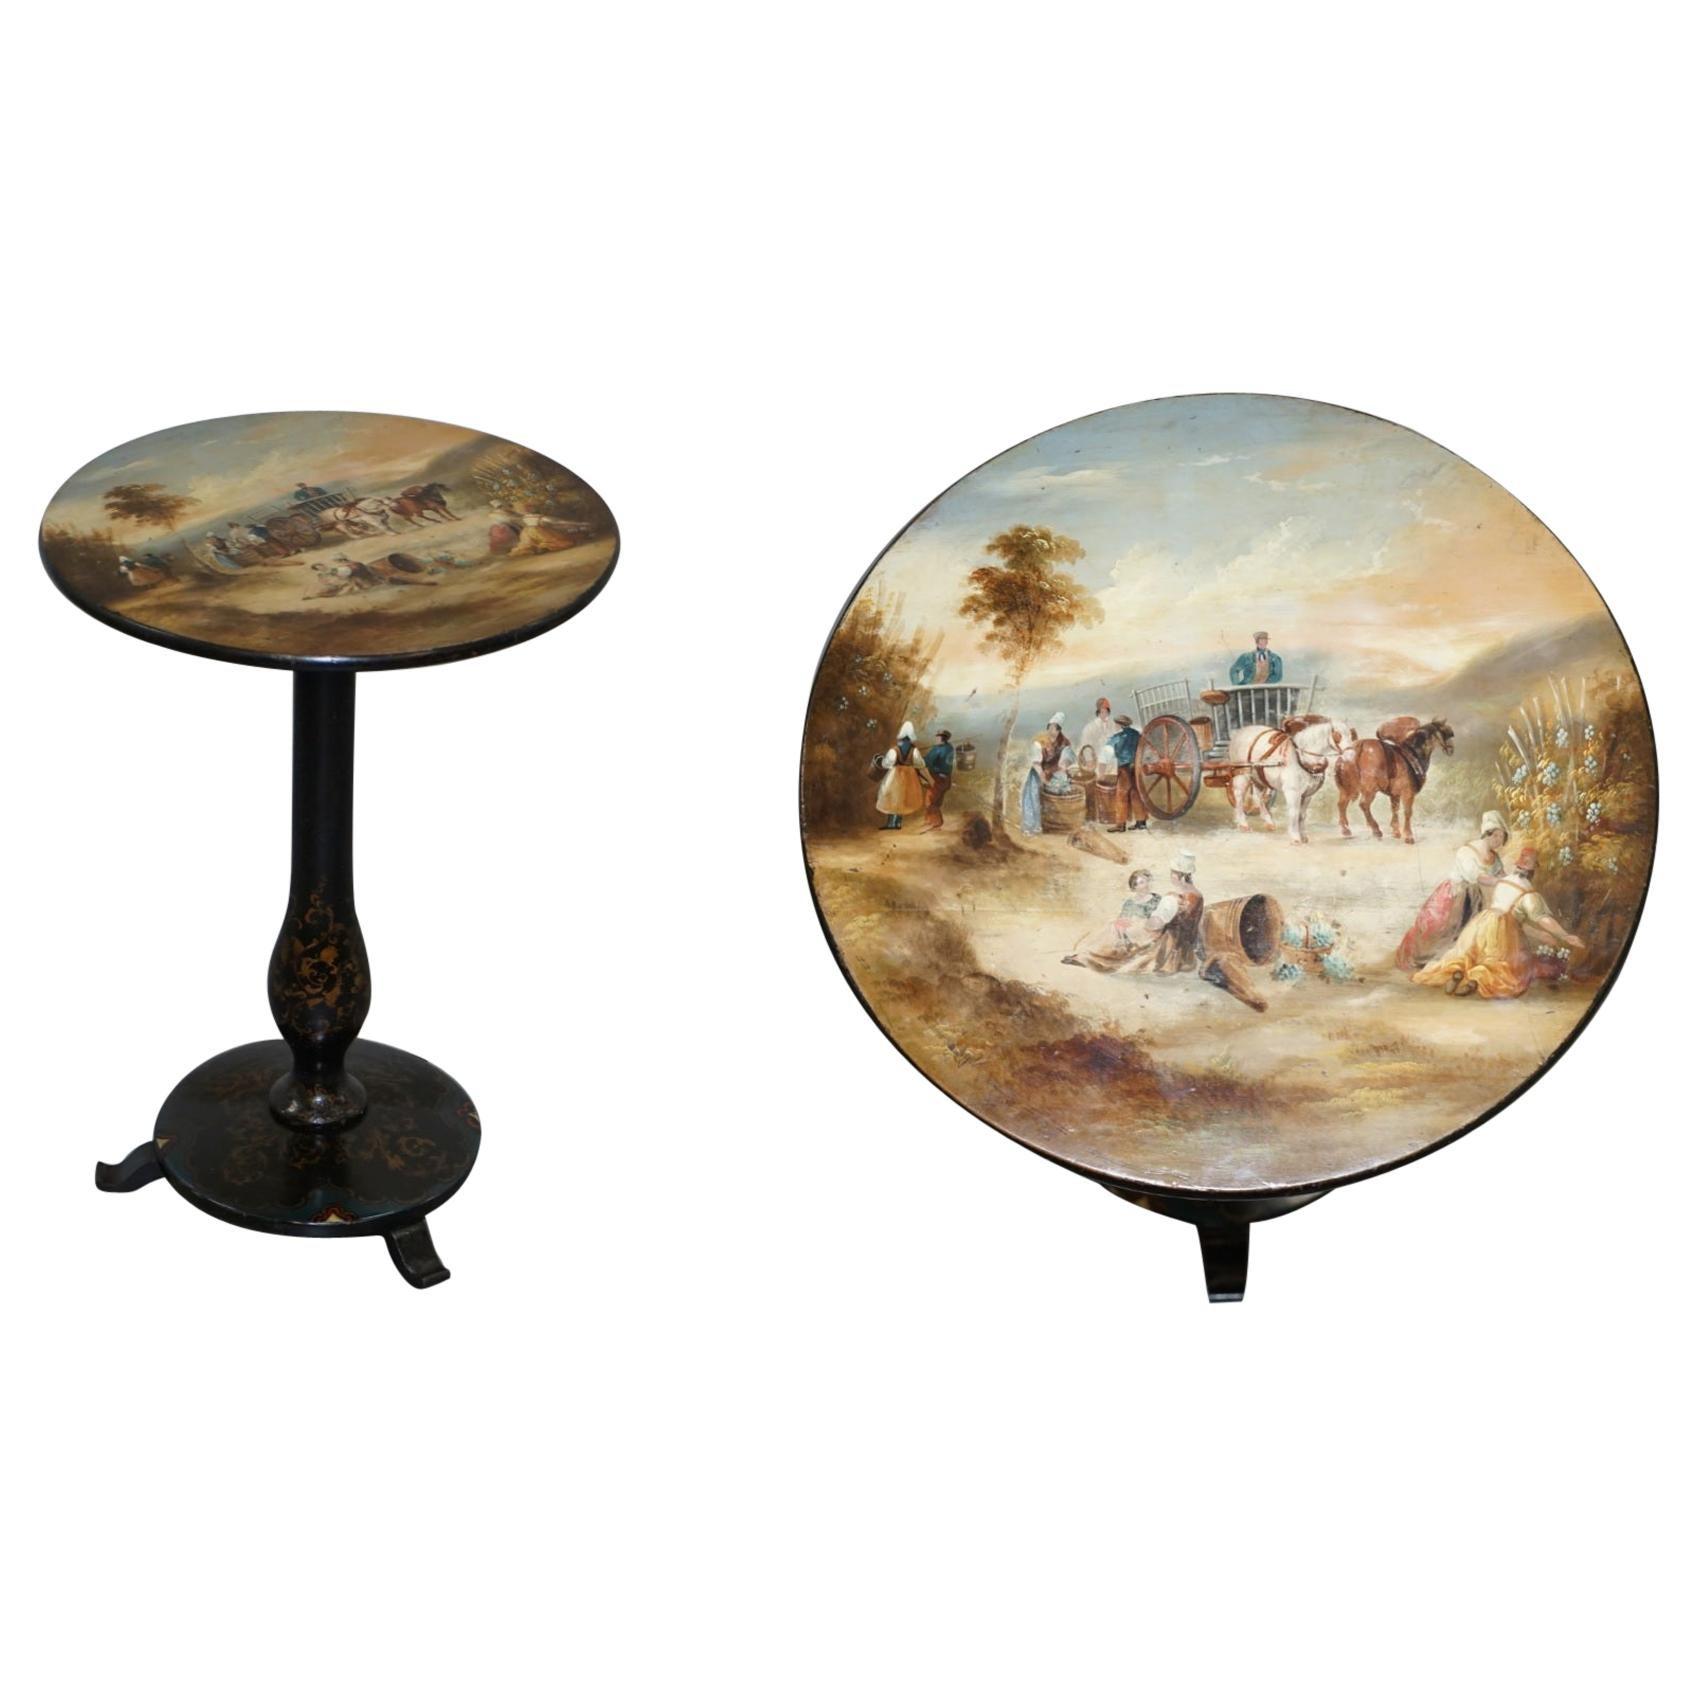 Sublime Victorian Polychrome Painted Parcel Gilt Tilt-Top Occasional Wine Table